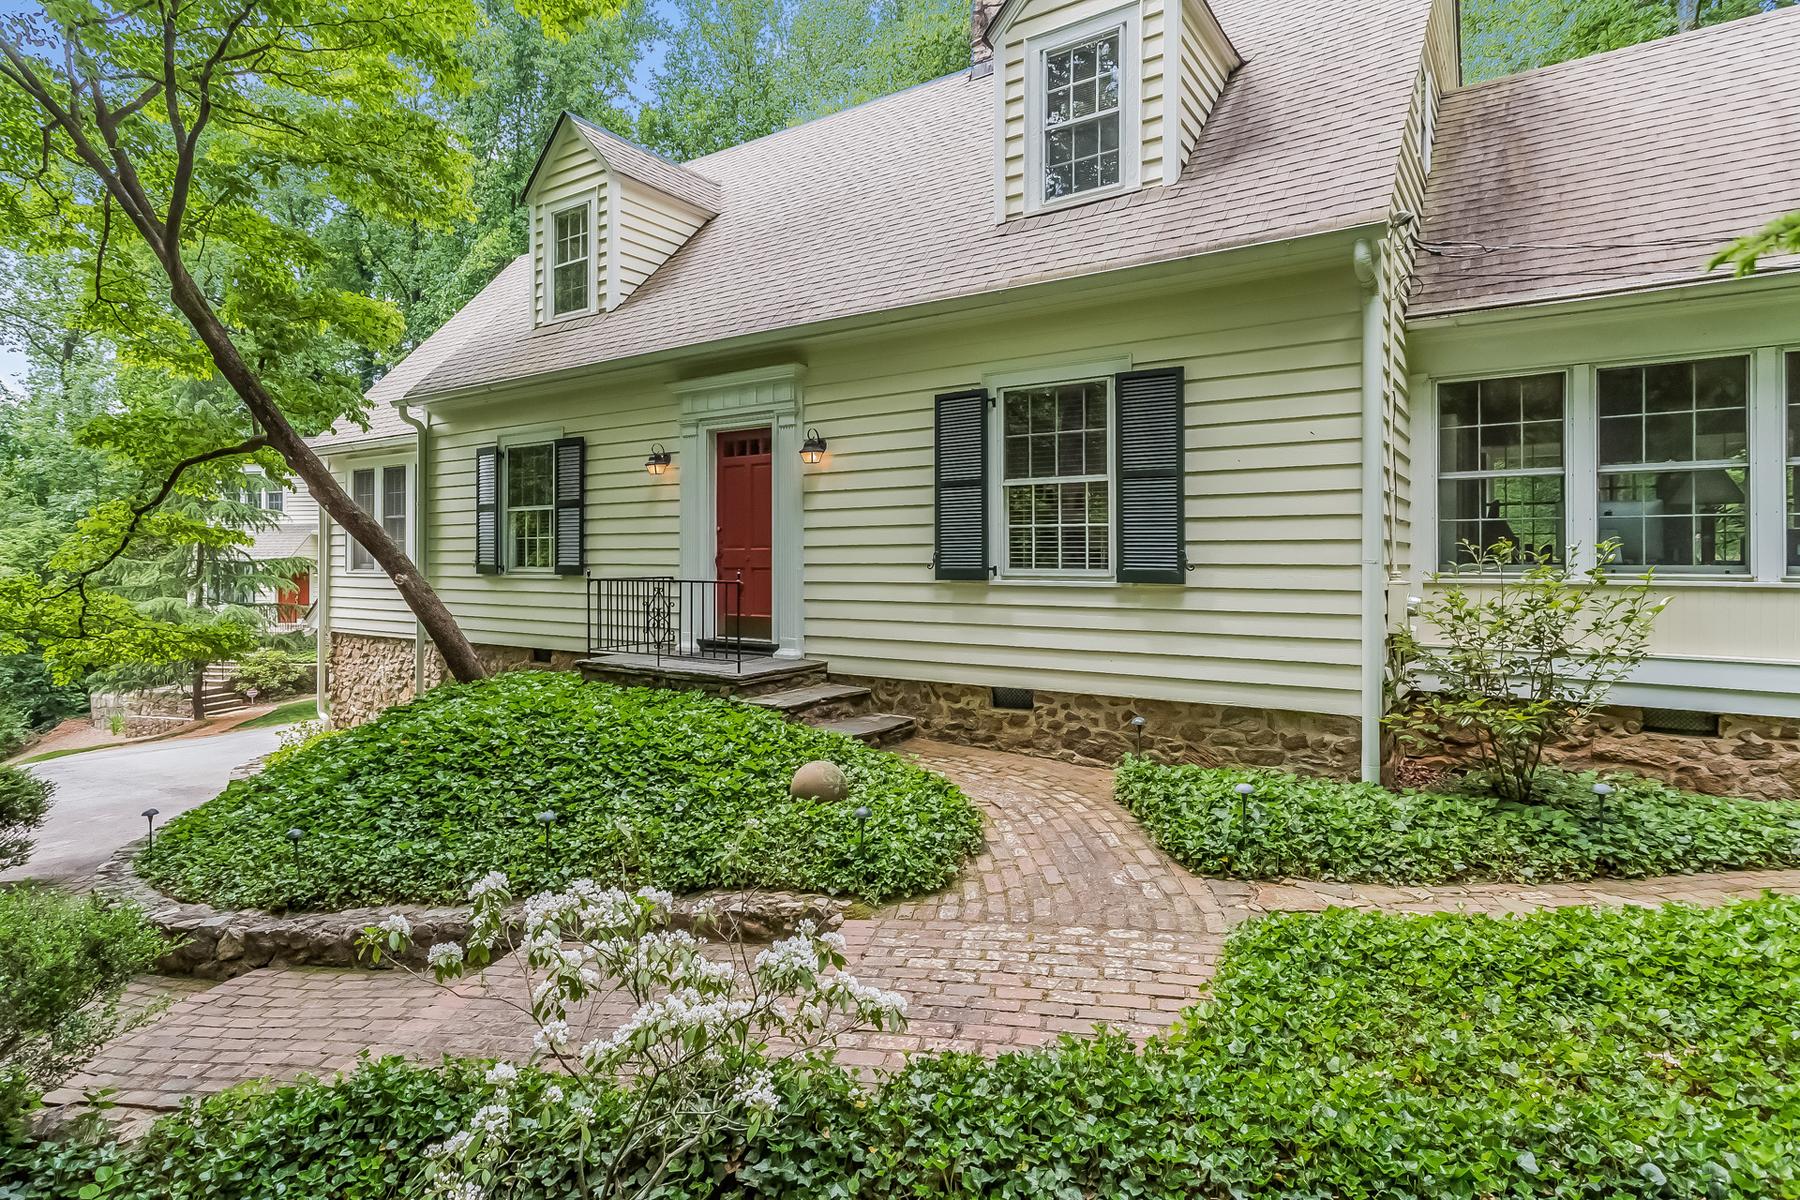 独户住宅 为 销售 在 Authentic Cape Cod Charmer And Carriage House 5580 Long Island Drive Sandy Springs, 乔治亚州 30327 美国